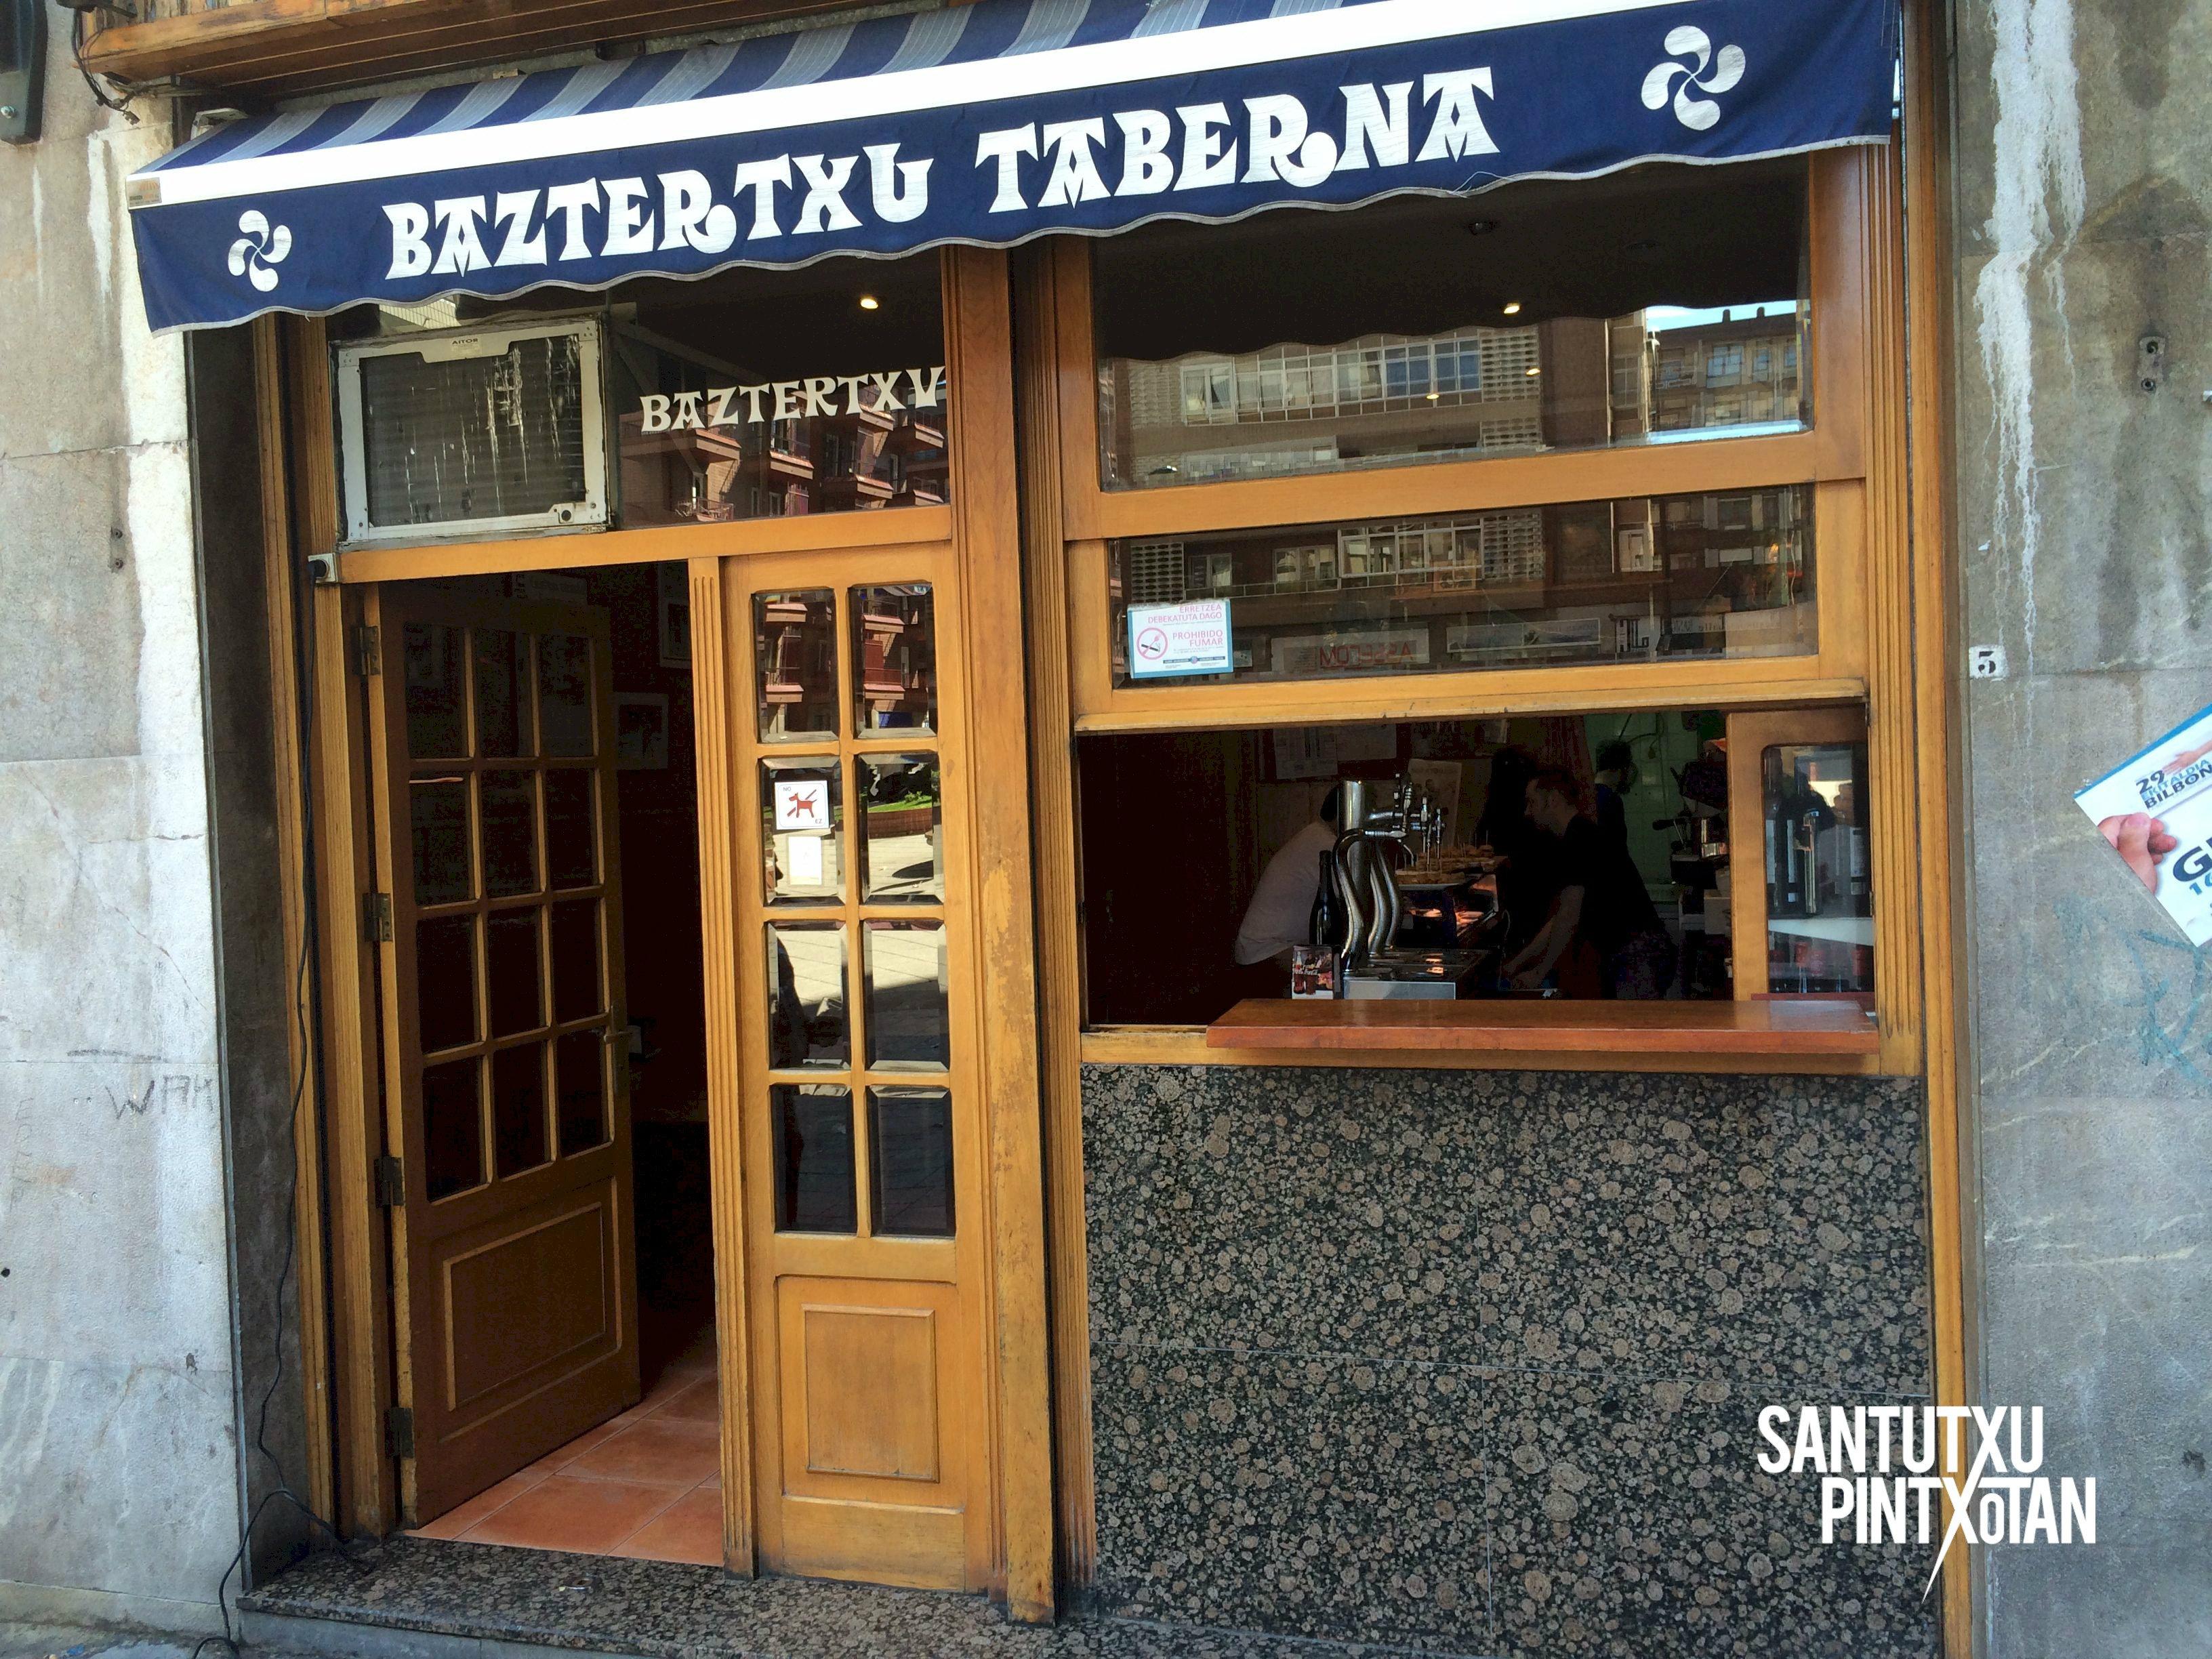 Baztertxu - Santutxu pintxotan